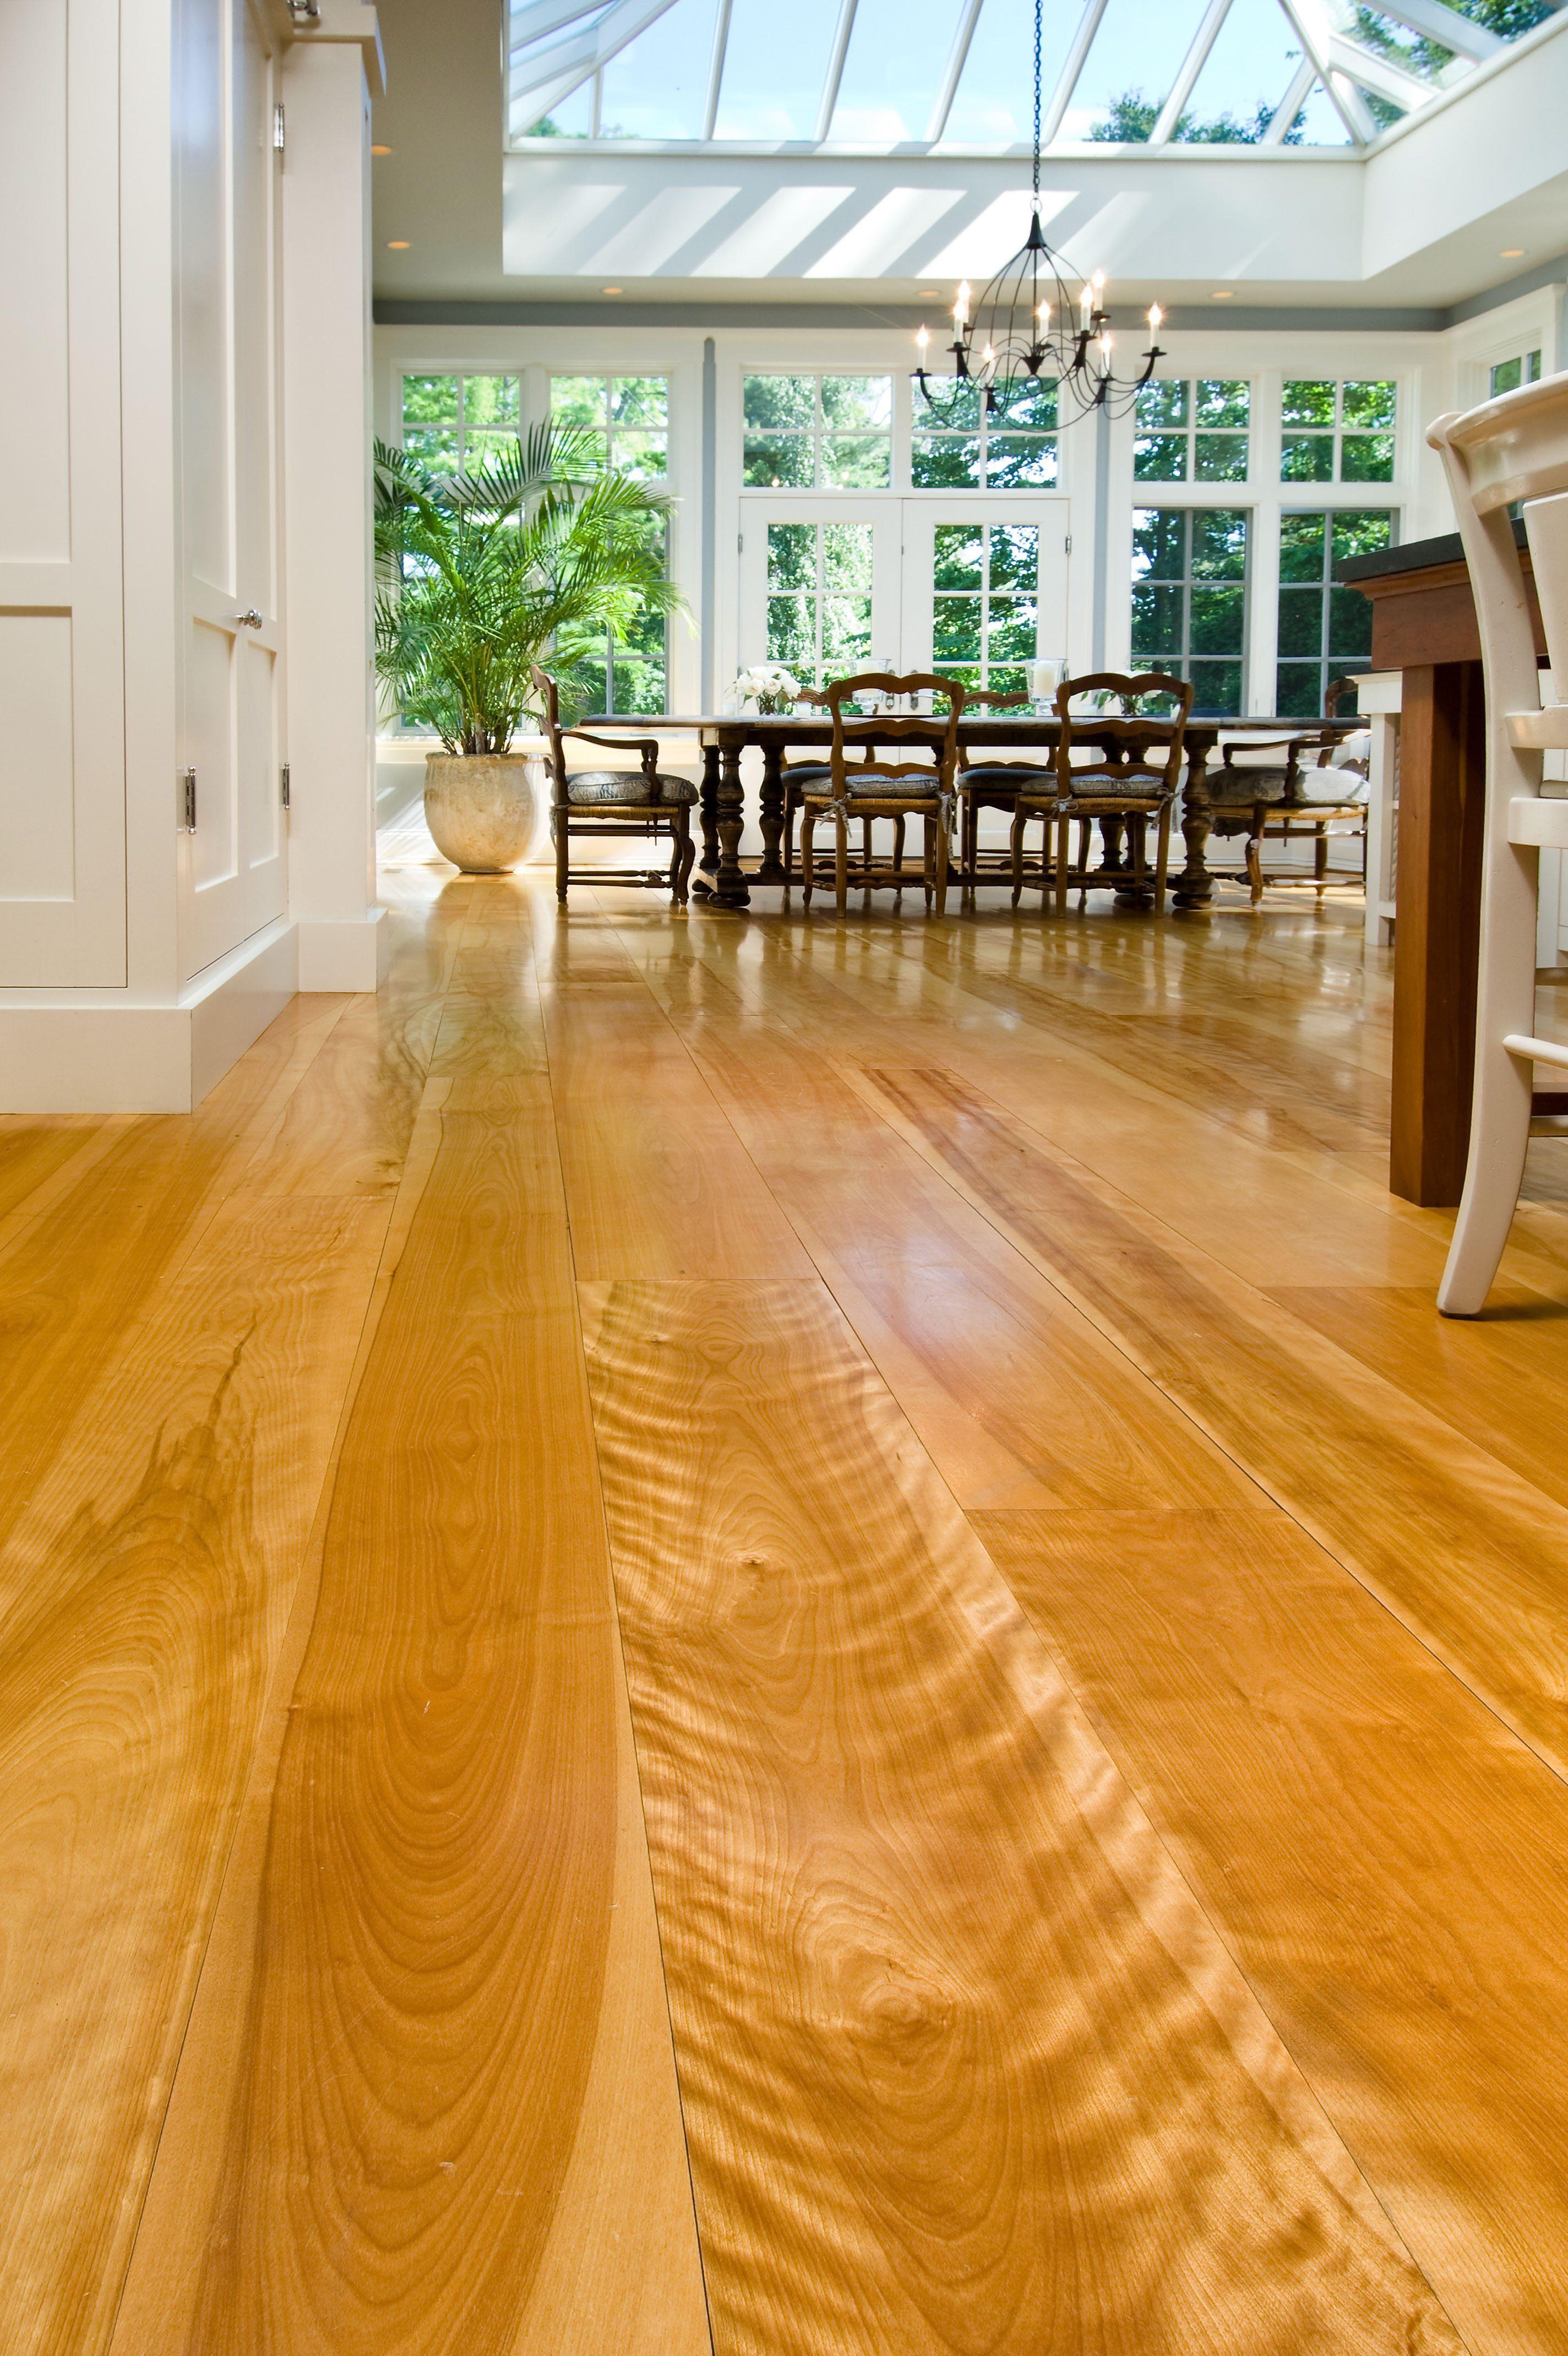 birch wood floors